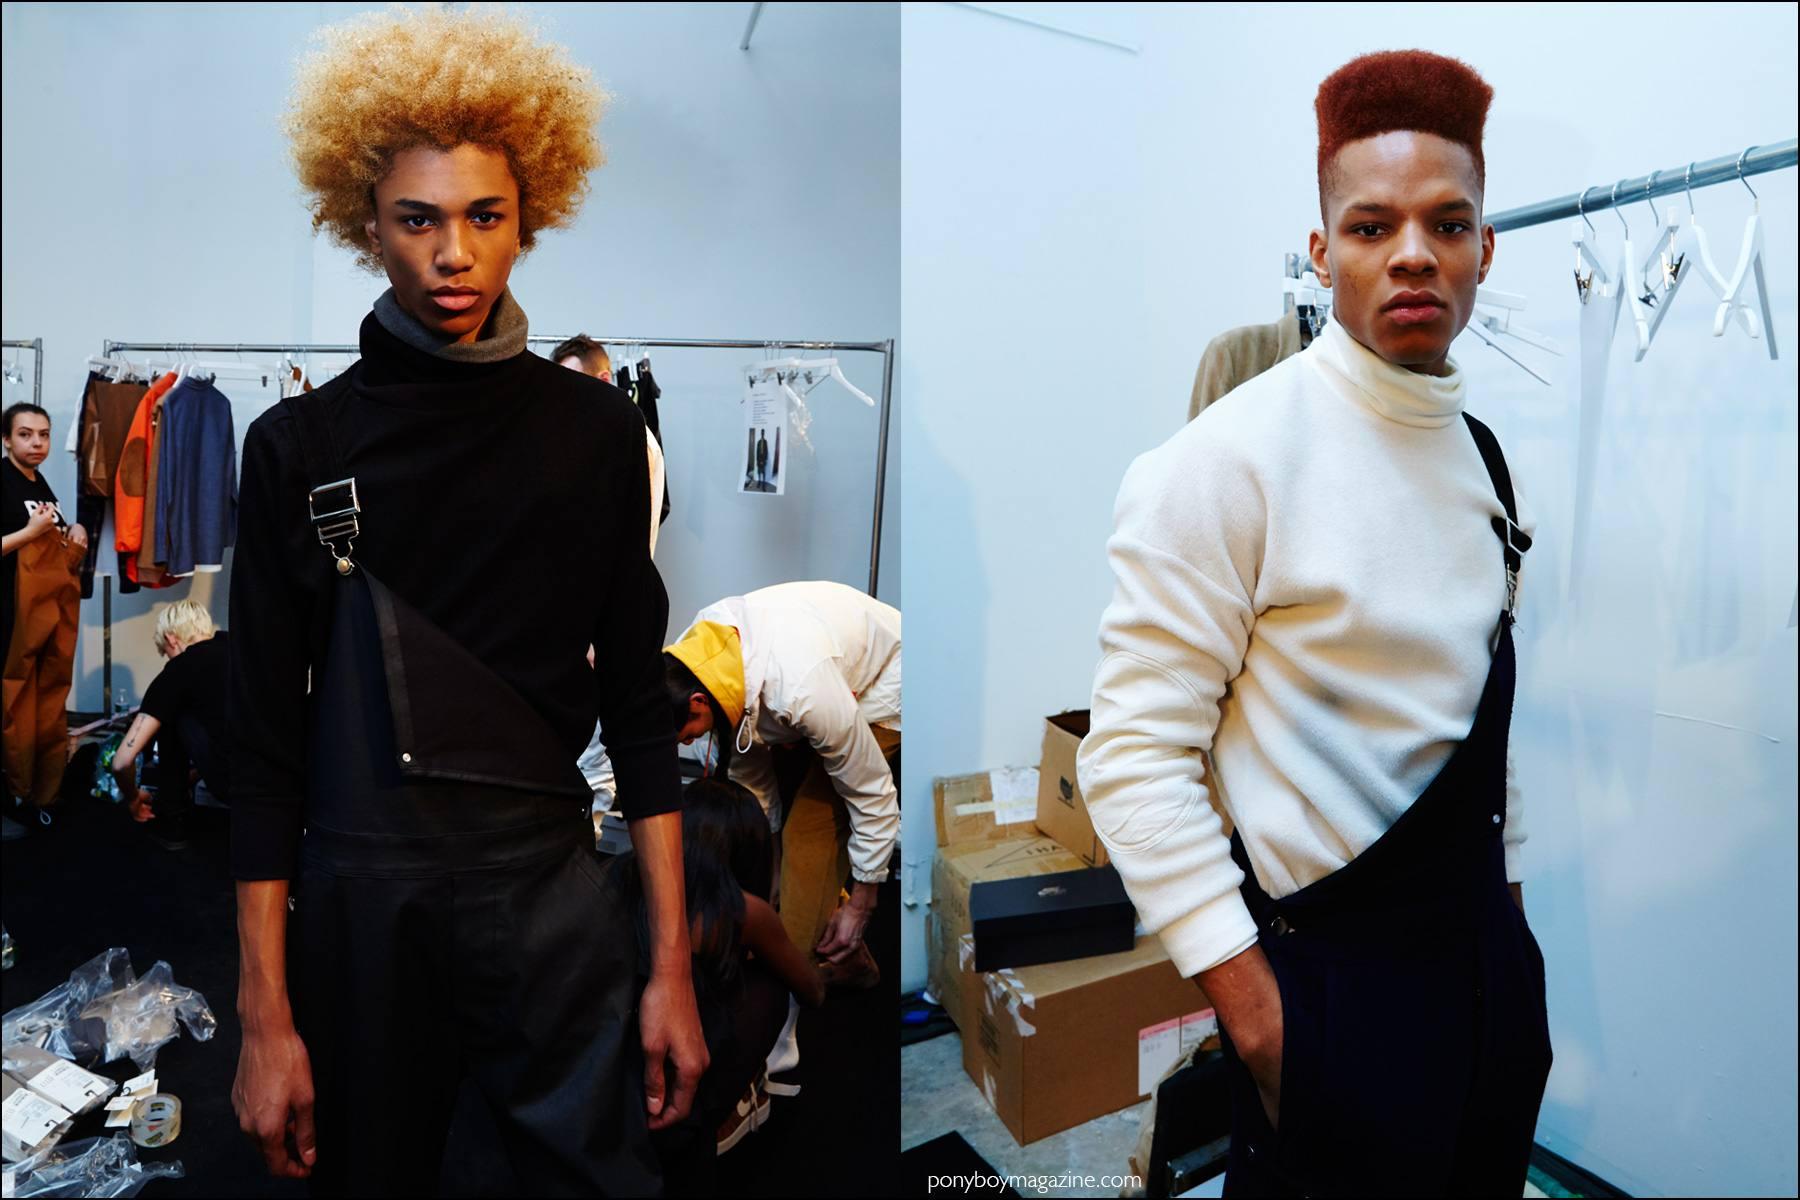 Model Michael Lockley snapped backstage at Rochambeau F/W16 menswear show by Alexander Thompson for Ponyboy magazine NY.